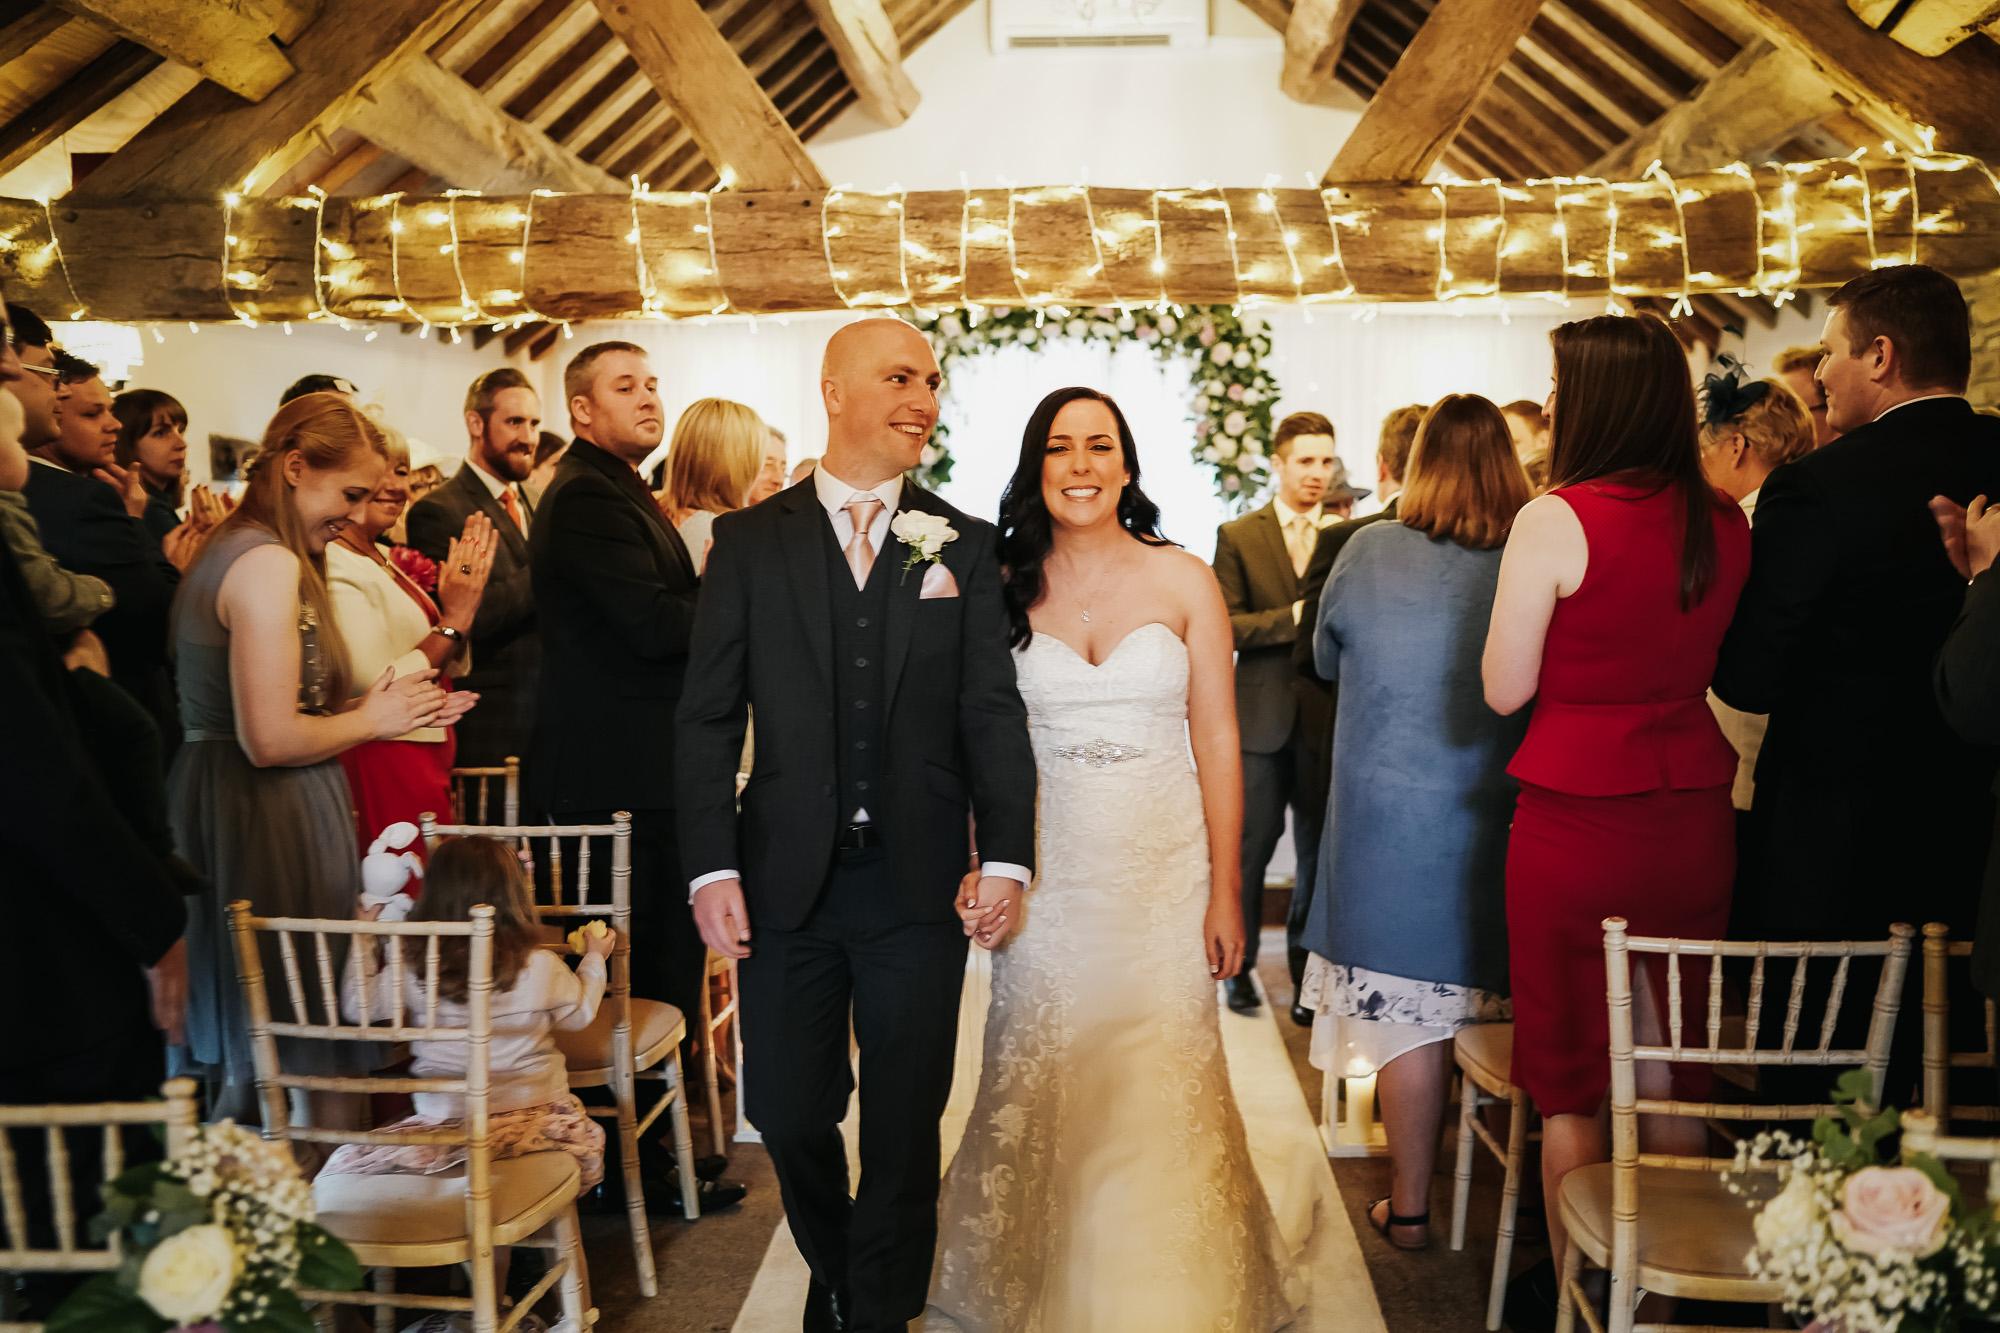 Hyde Bank Farm Wedding Photography Manchester wedding photographer (26 of 49).jpg